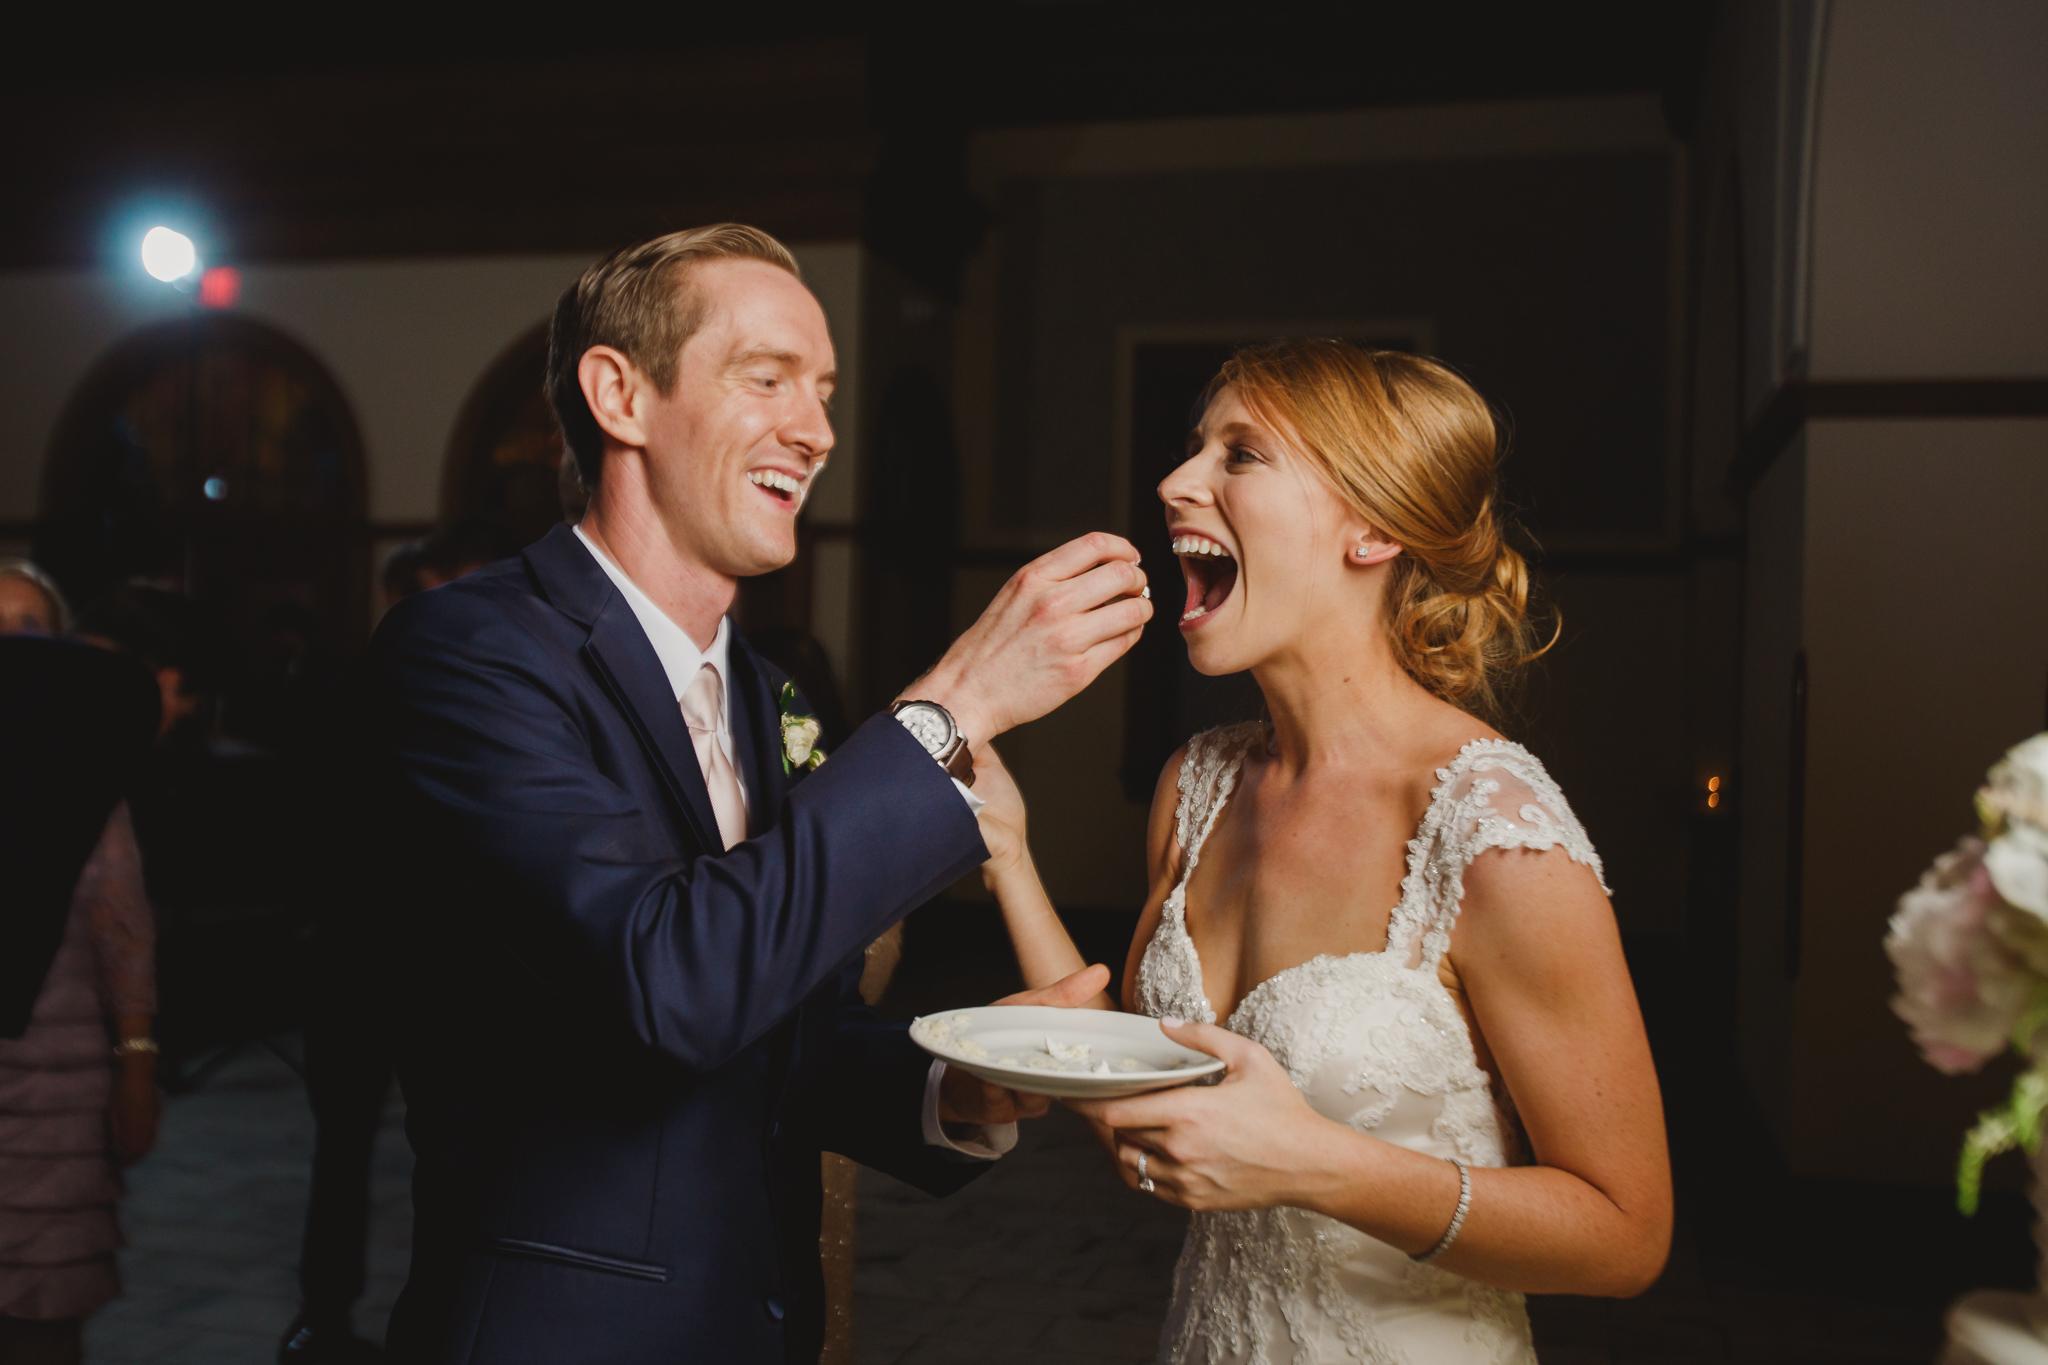 Michael and Kelly - the ashton depot - wedding DFW - wedding photographer- elizalde photography (121 of 150).jpg